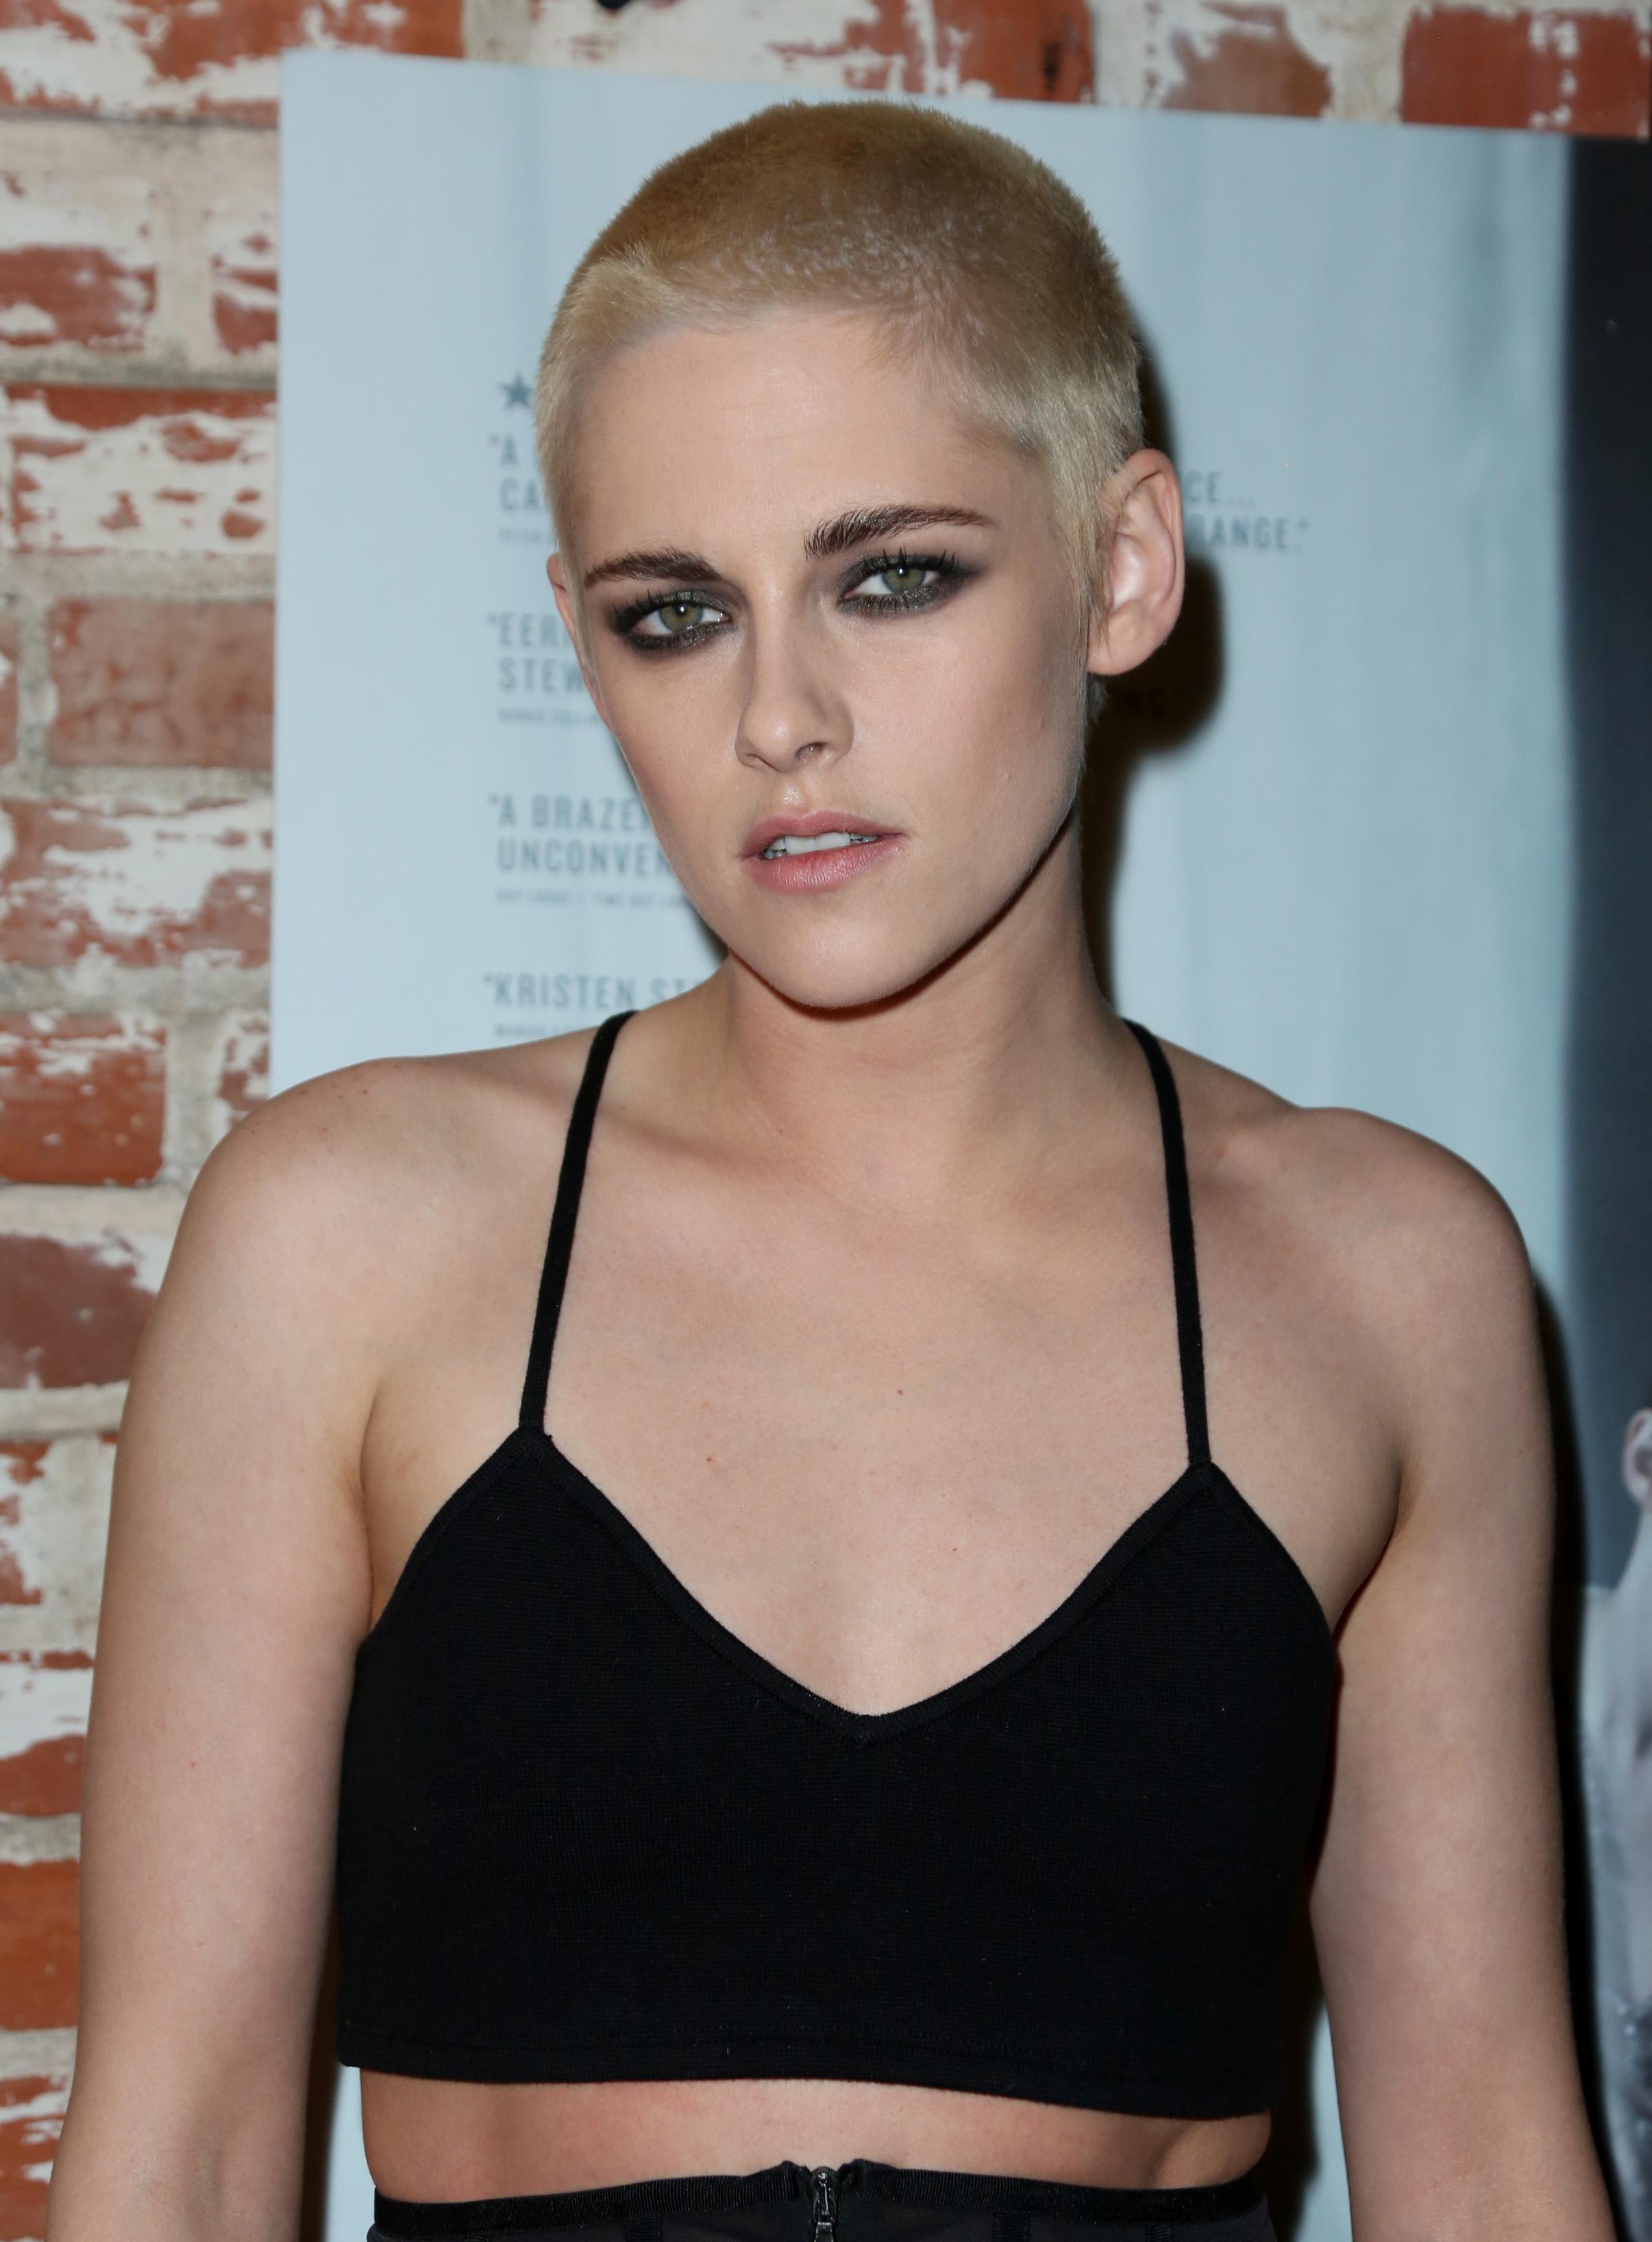 Kristen Stewart Unveils Her New Edgy Buzz Cut At 'Personal Shopper' Premiere